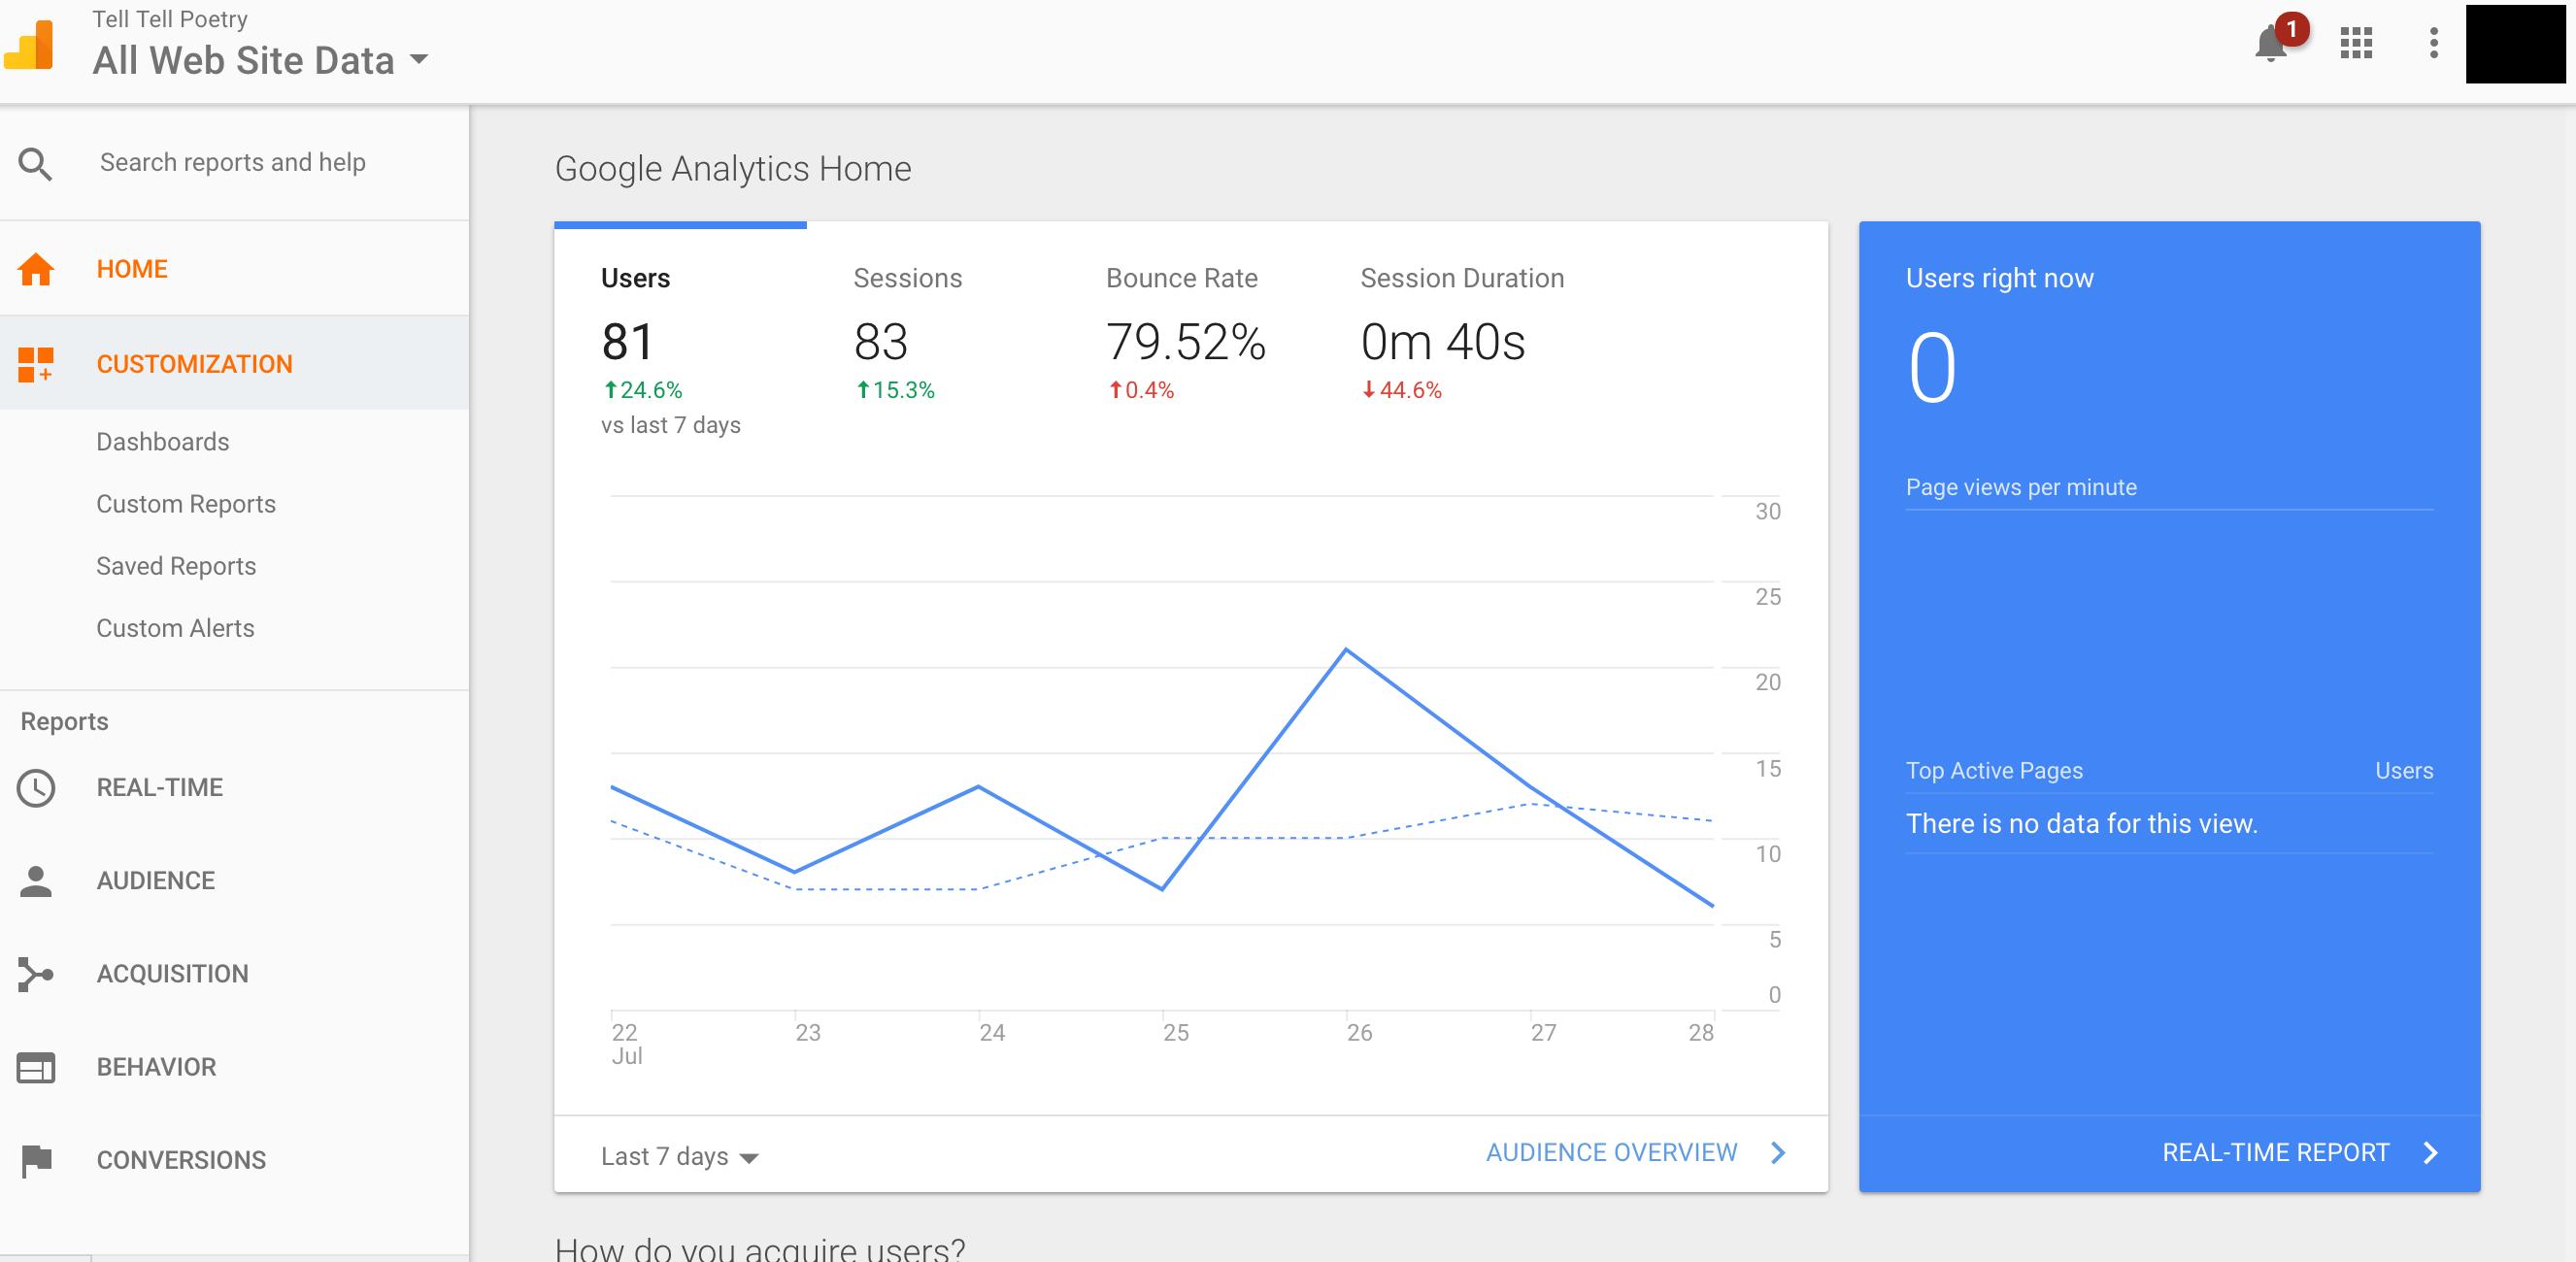 Seo & Journalism, Google a misura dei giornalisti (o quasi)